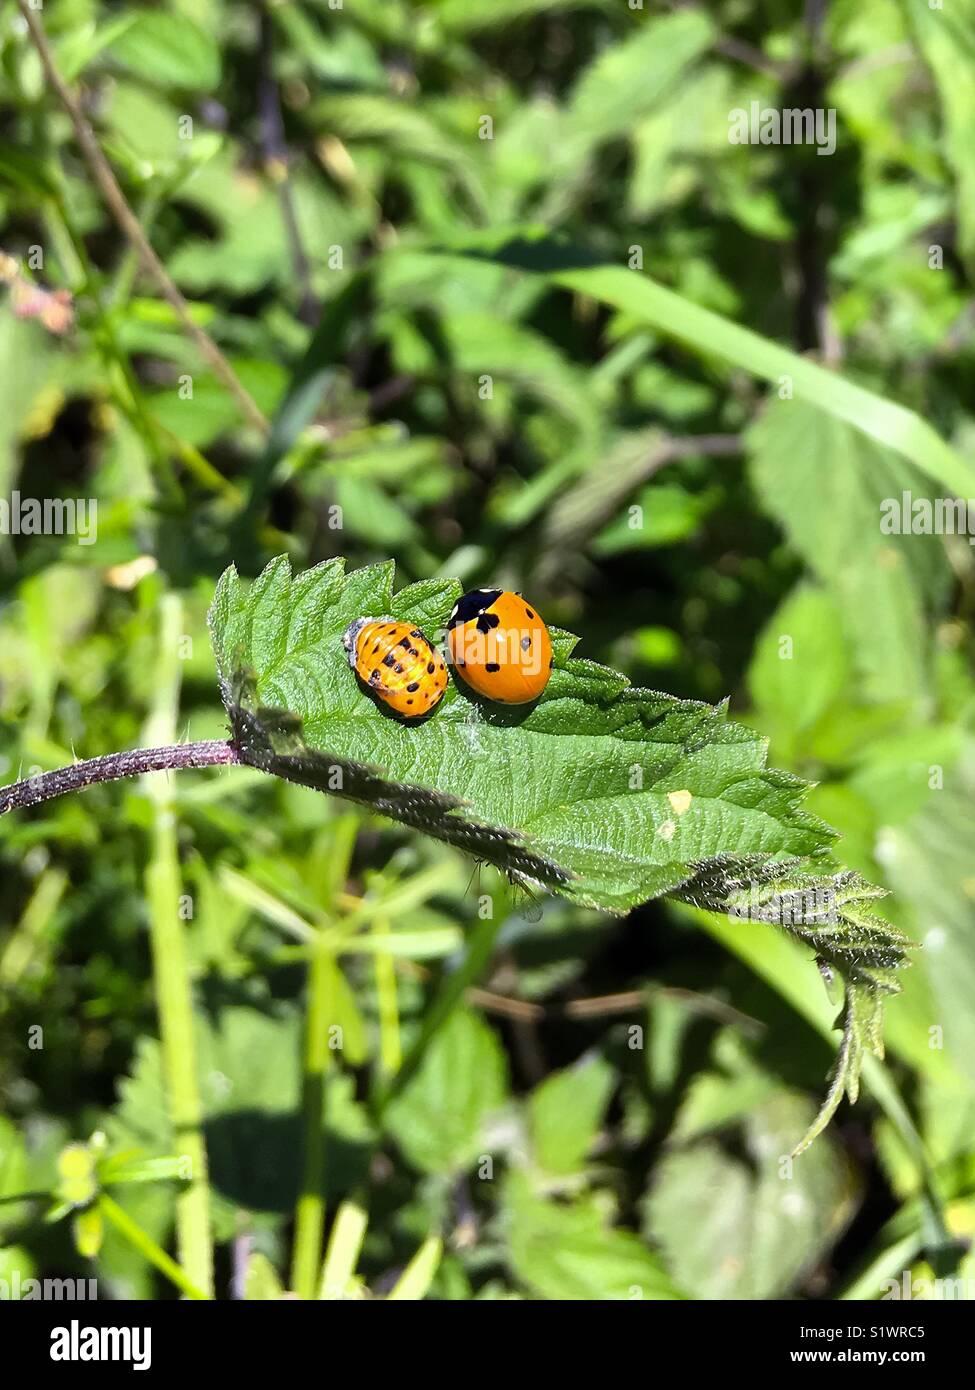 Mariquita y larva pupa en la hoja verde Imagen De Stock